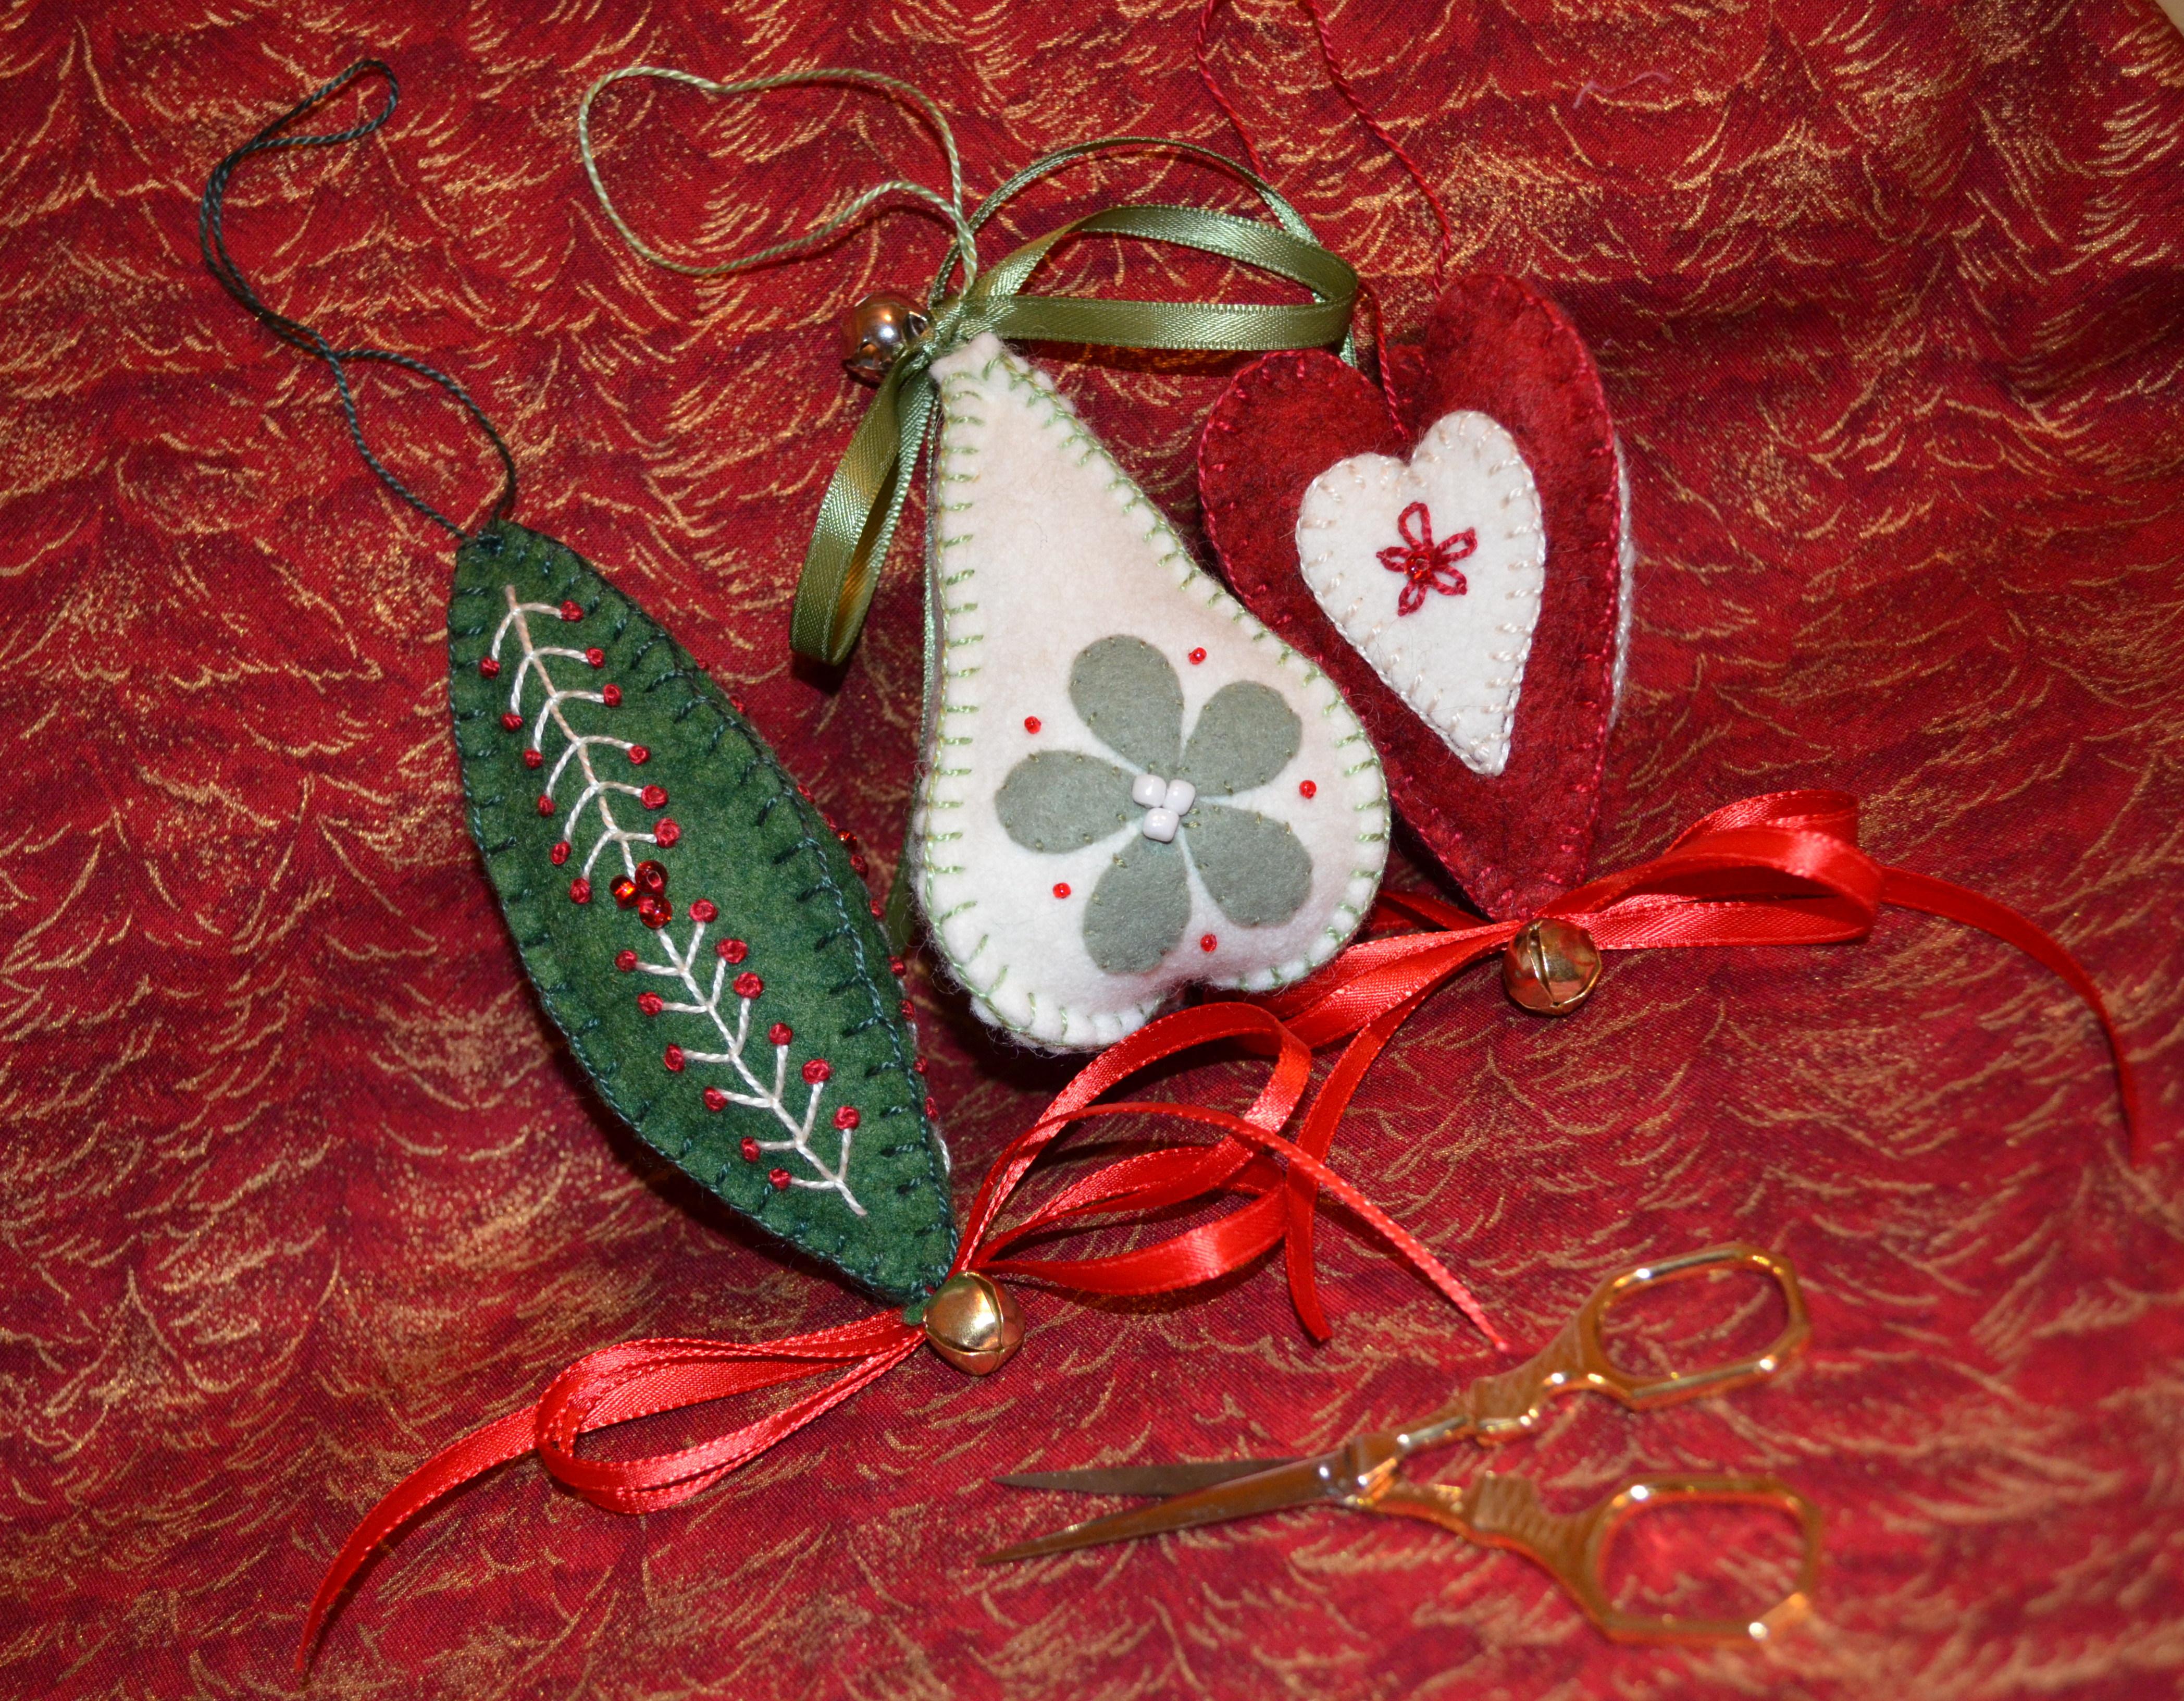 Wool felt ornaments - Wool Felt Ornaments 2